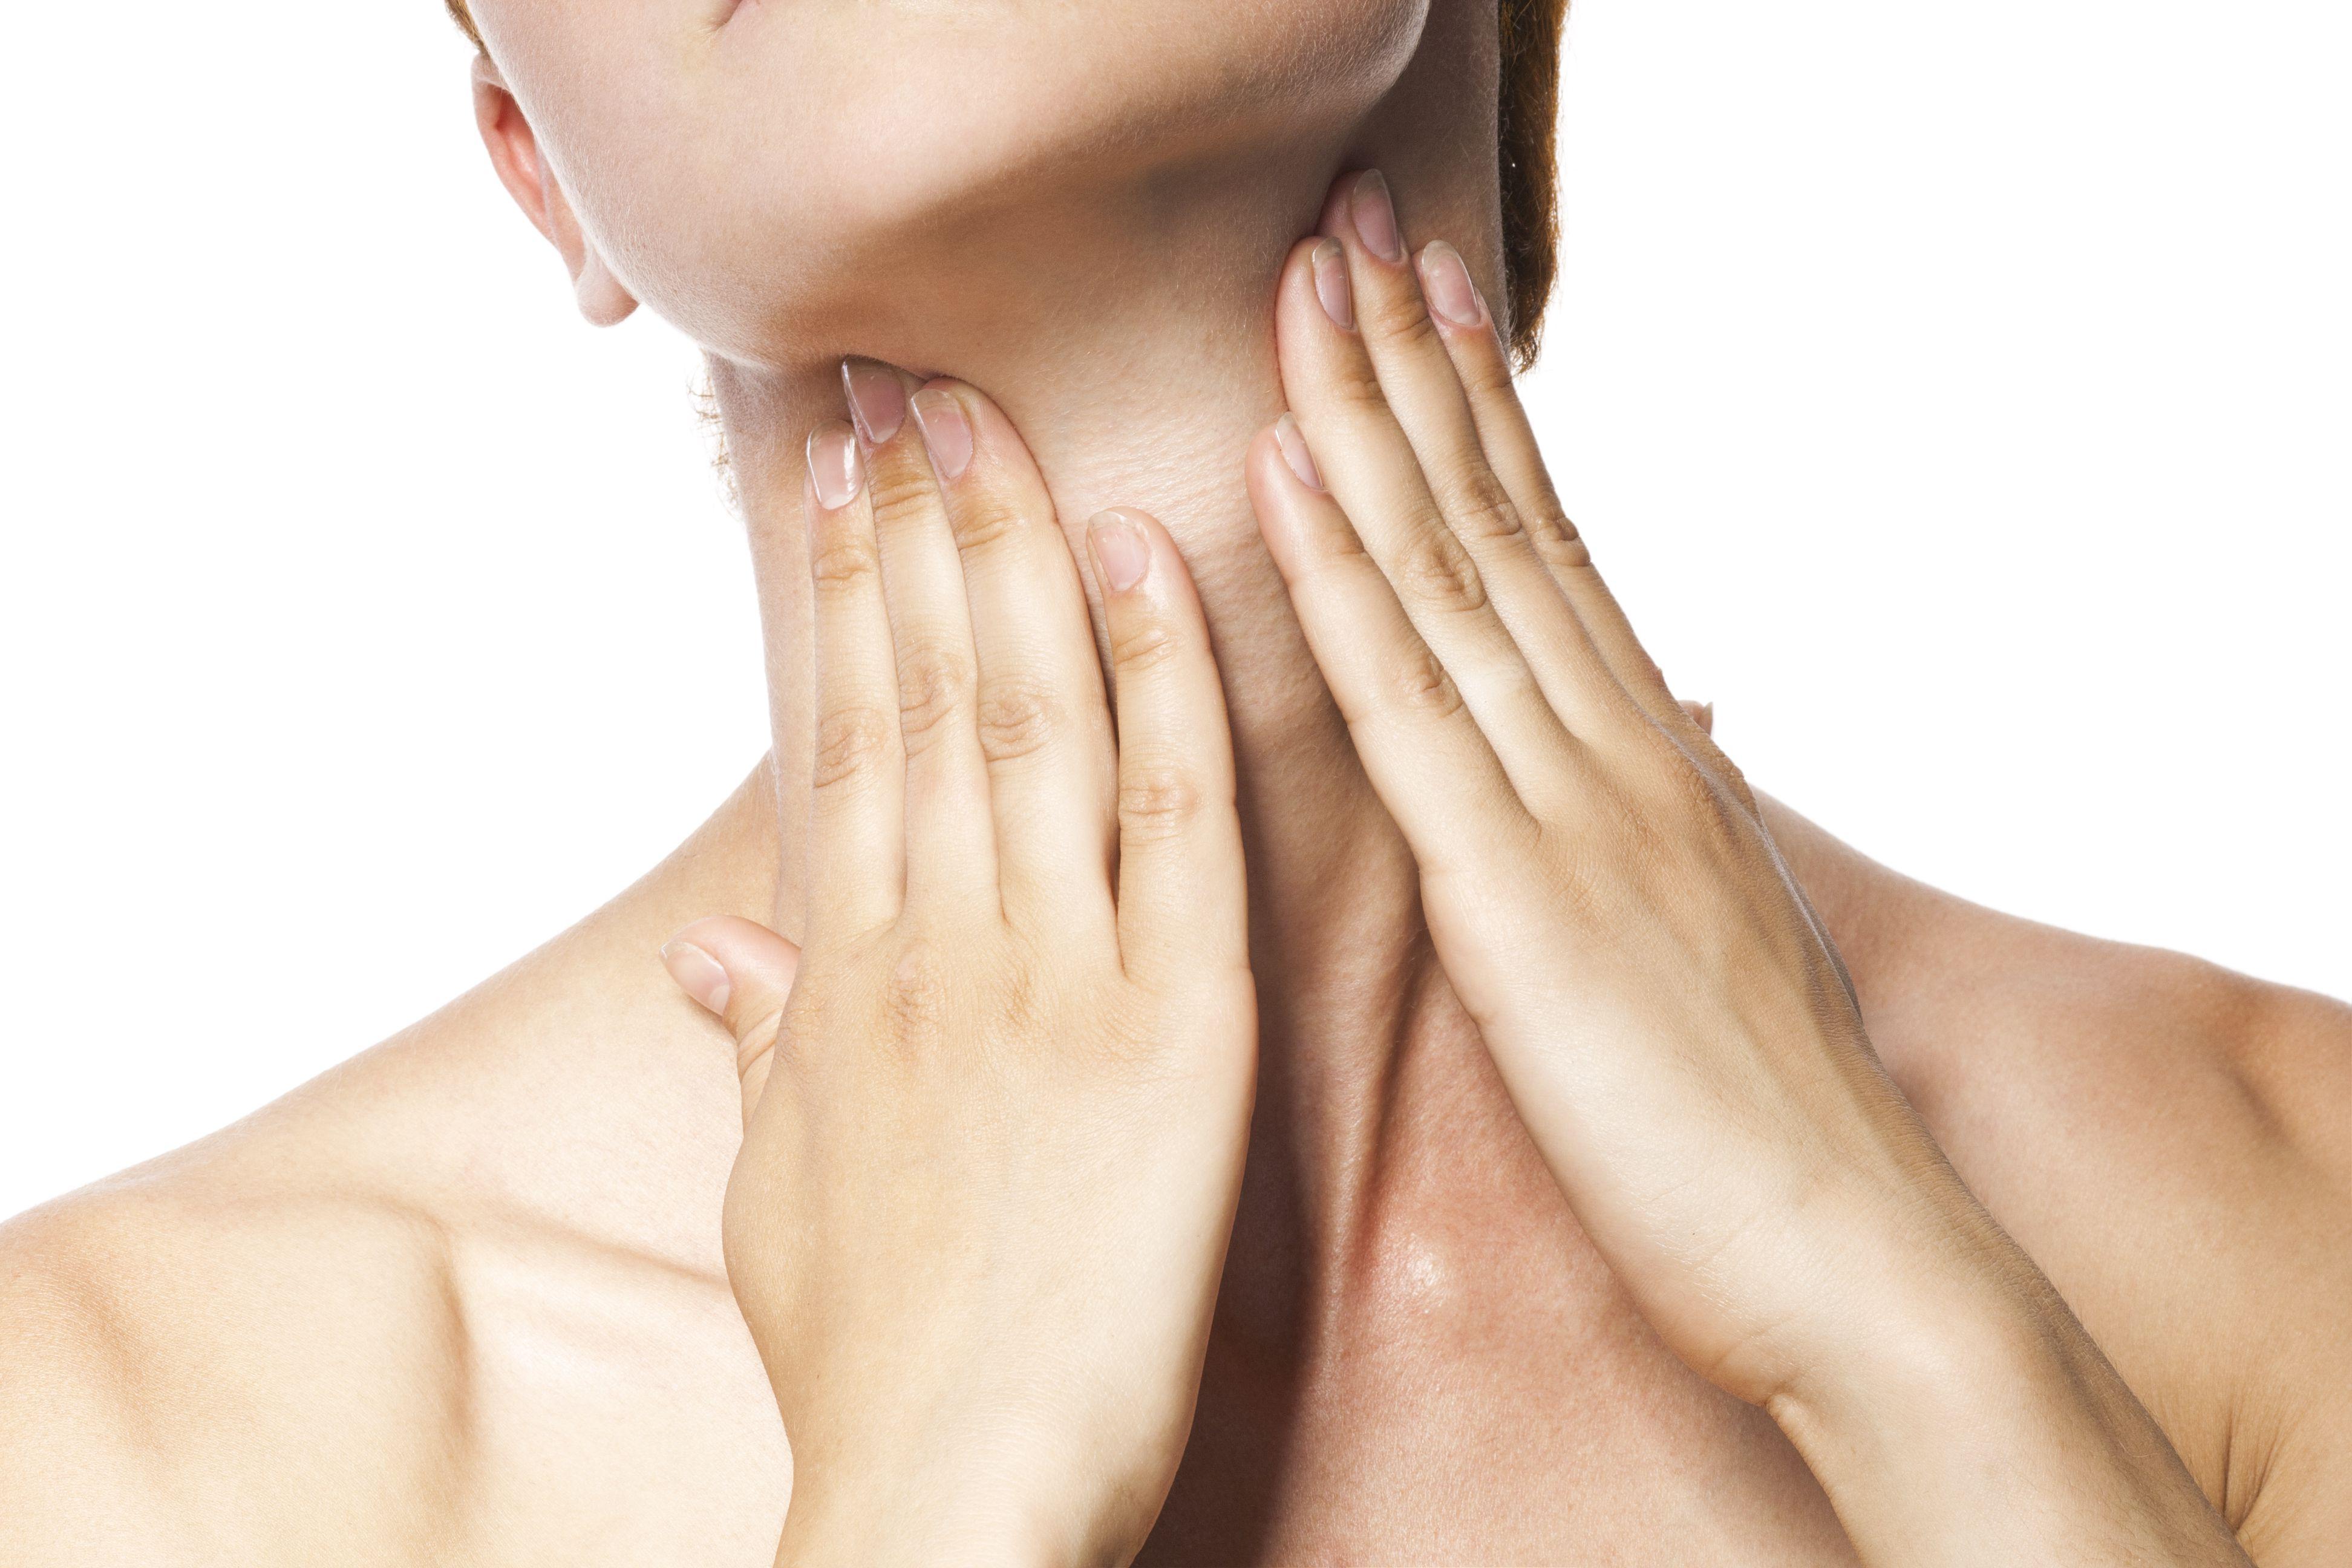 Traitement de l'angine de poitrine avec Ayurveda